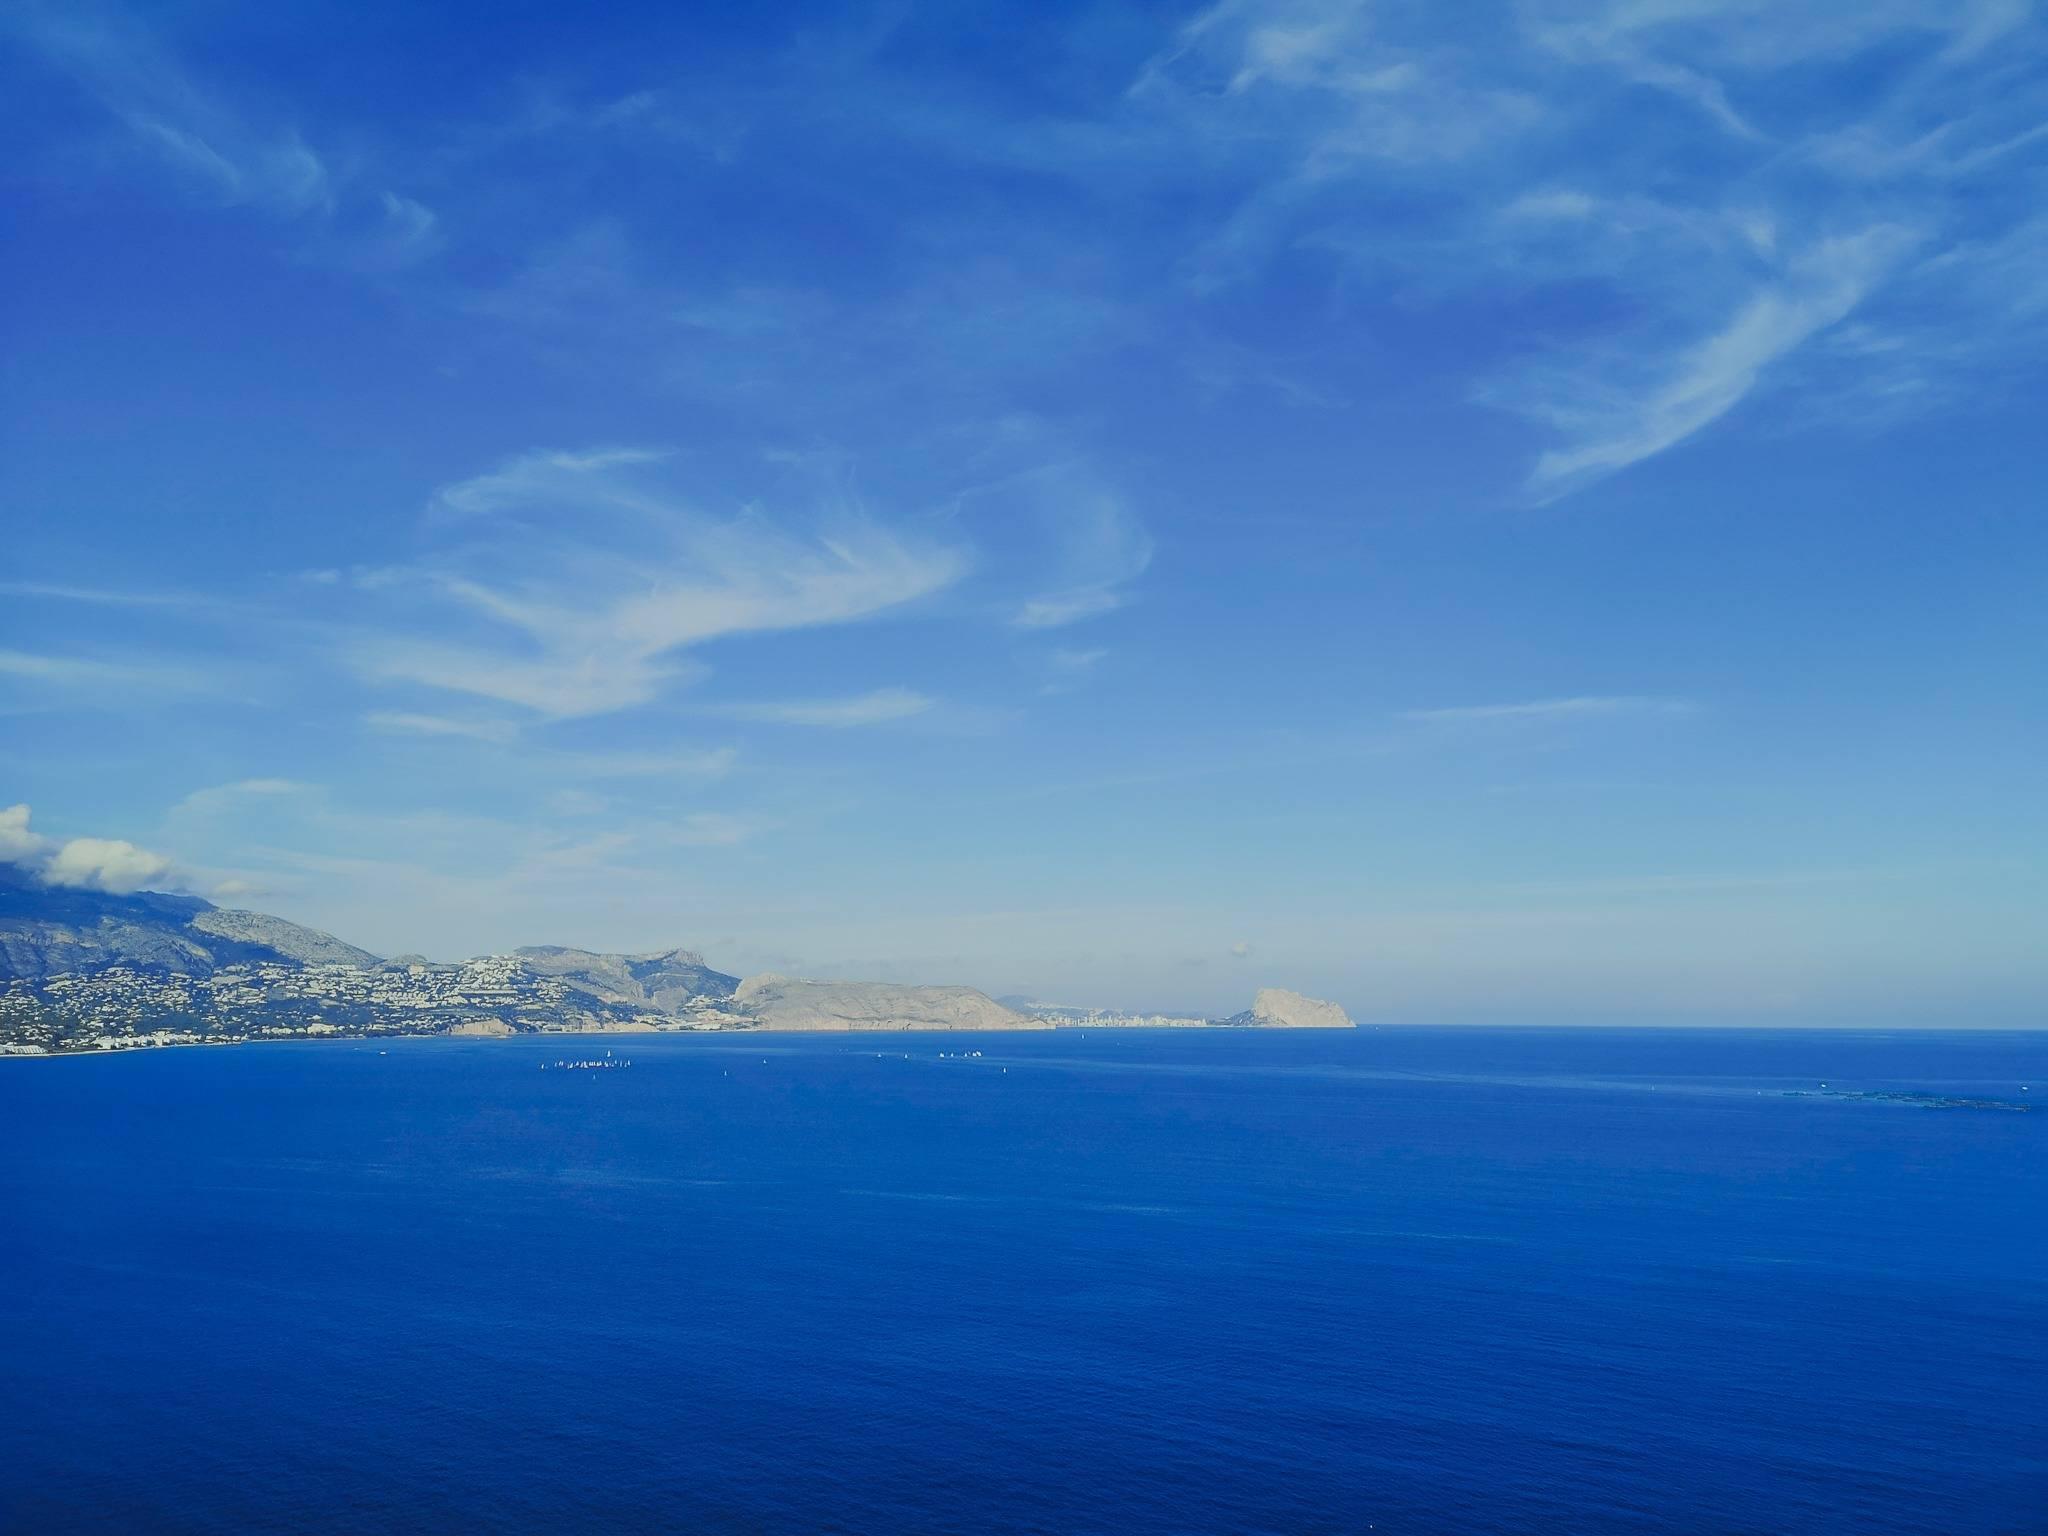 Penon de Ifach from Camino del Faro. Photo by Alis Monte [CC BY-SA 4.0], via Connecting the Dots